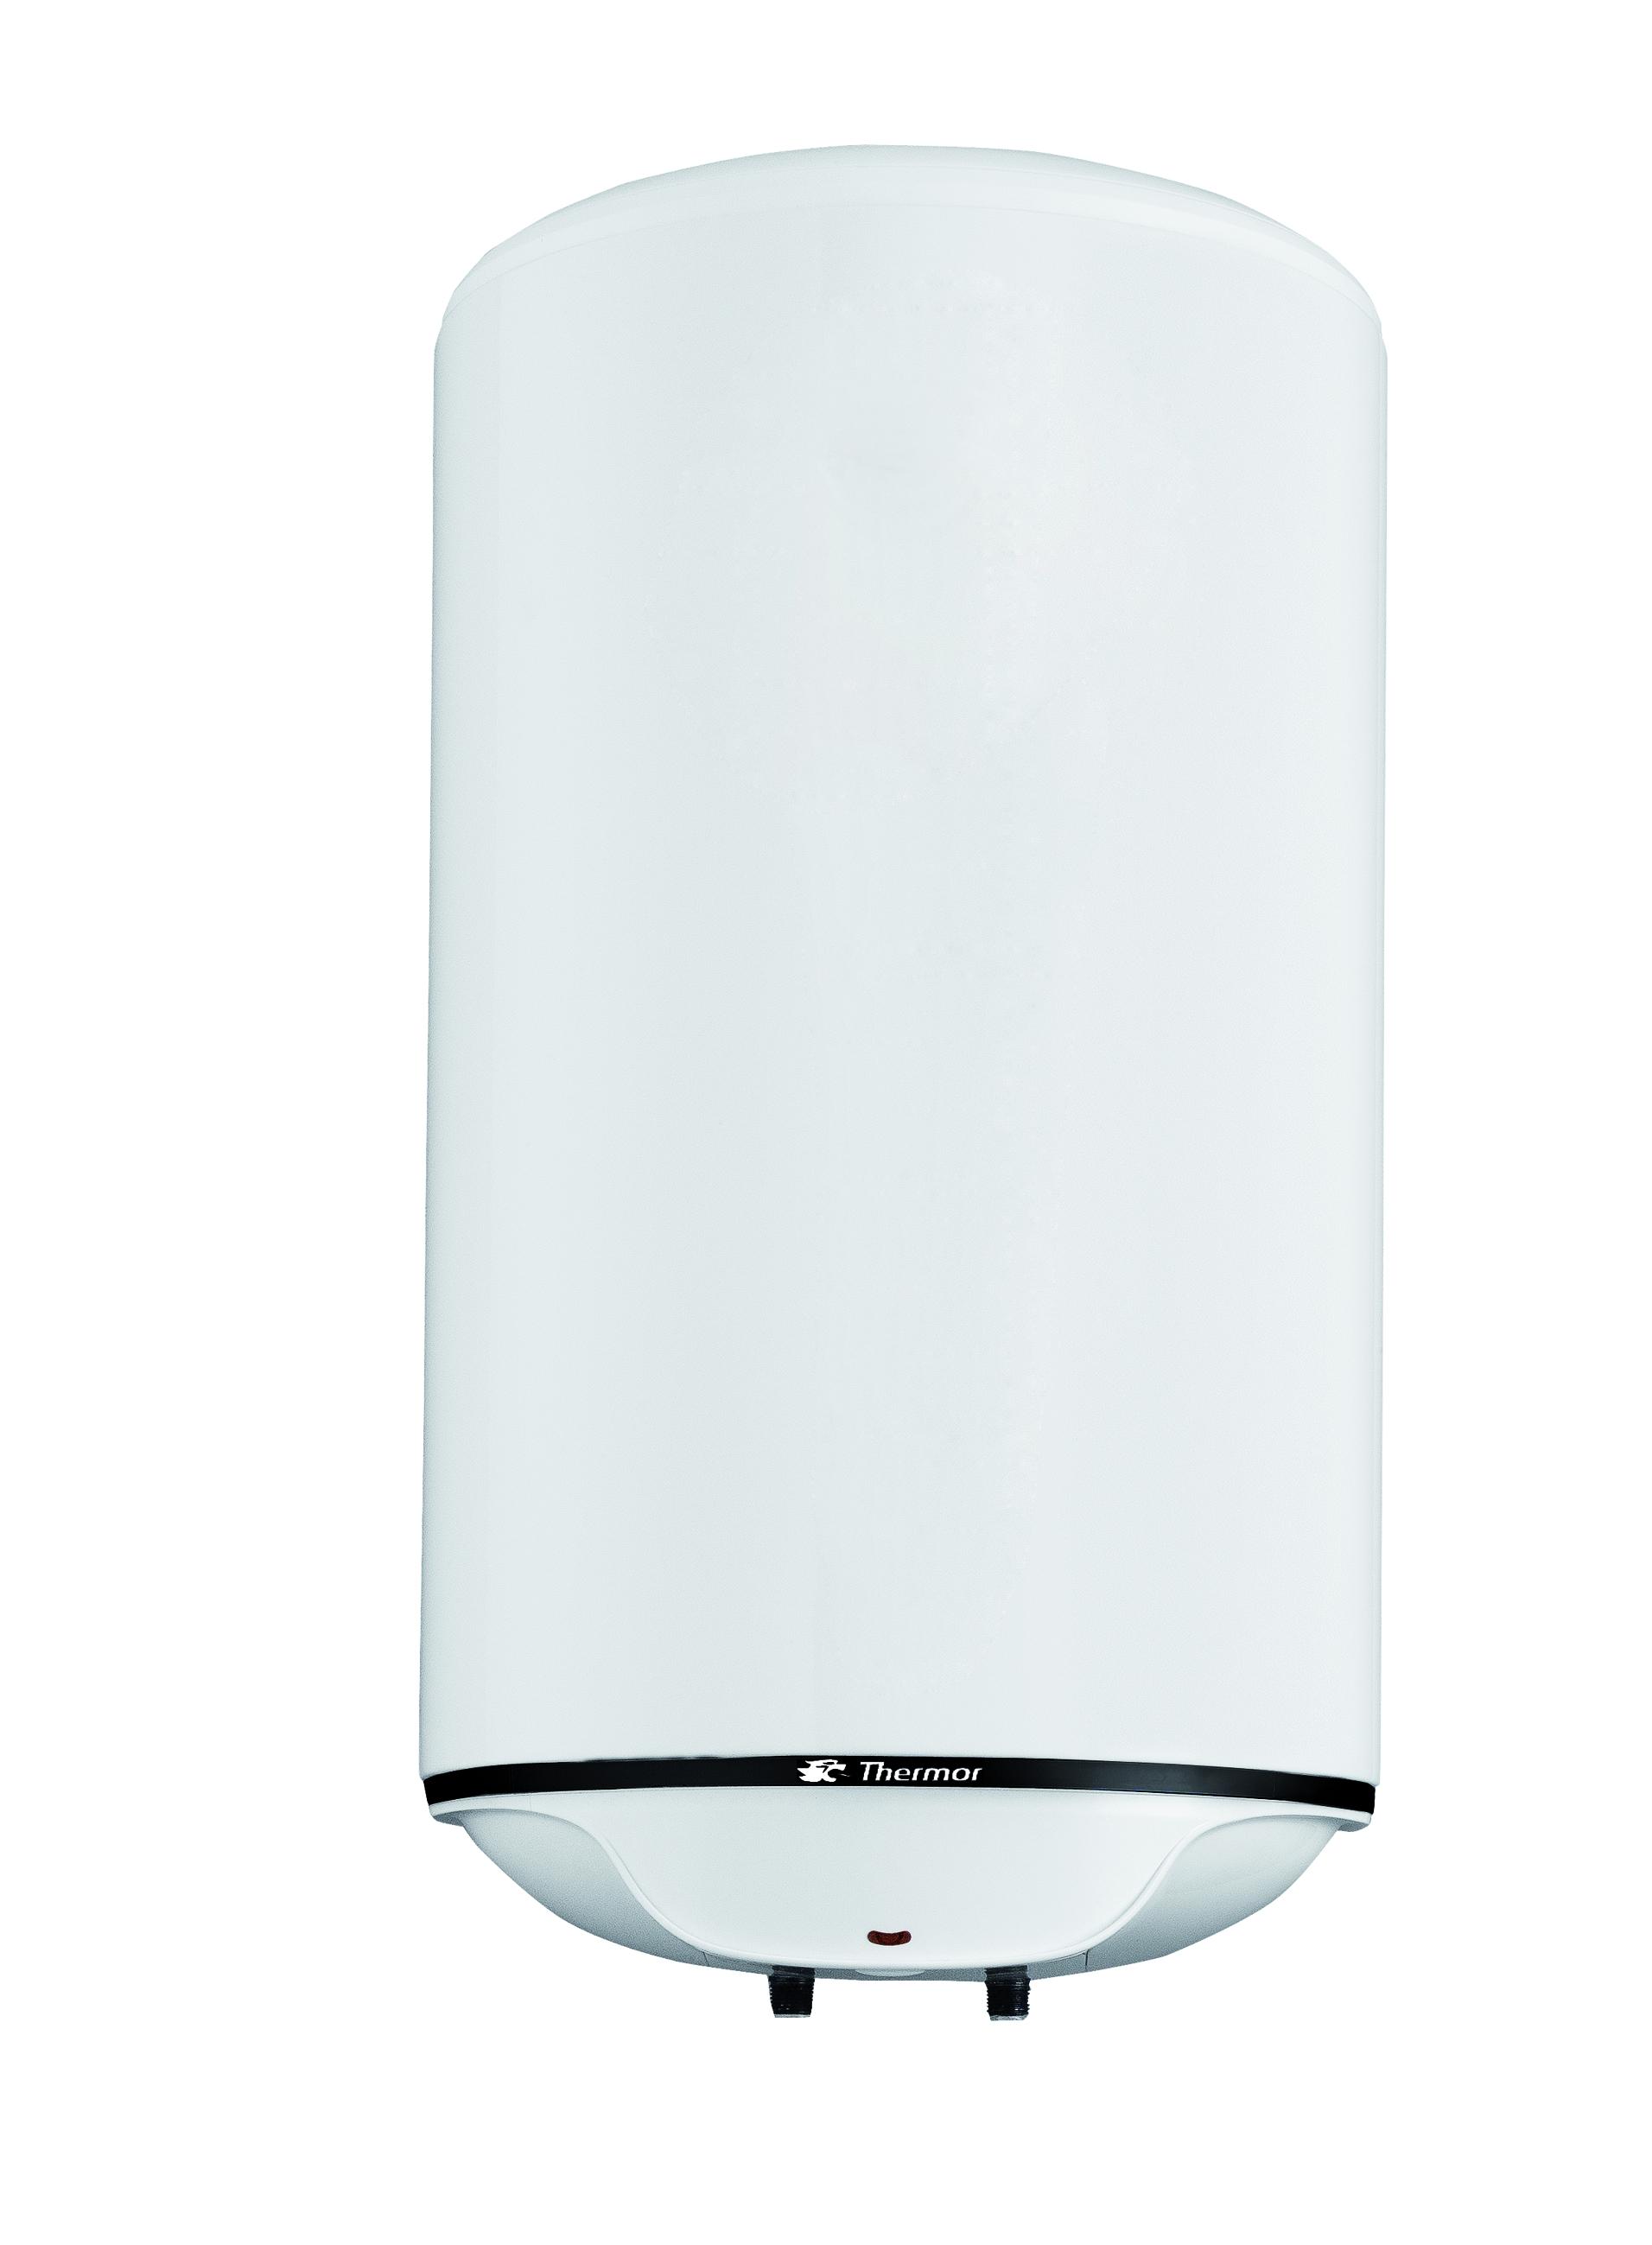 Termo el ctrico thermor concept 80l v compra en - Termo electrico 80l ...